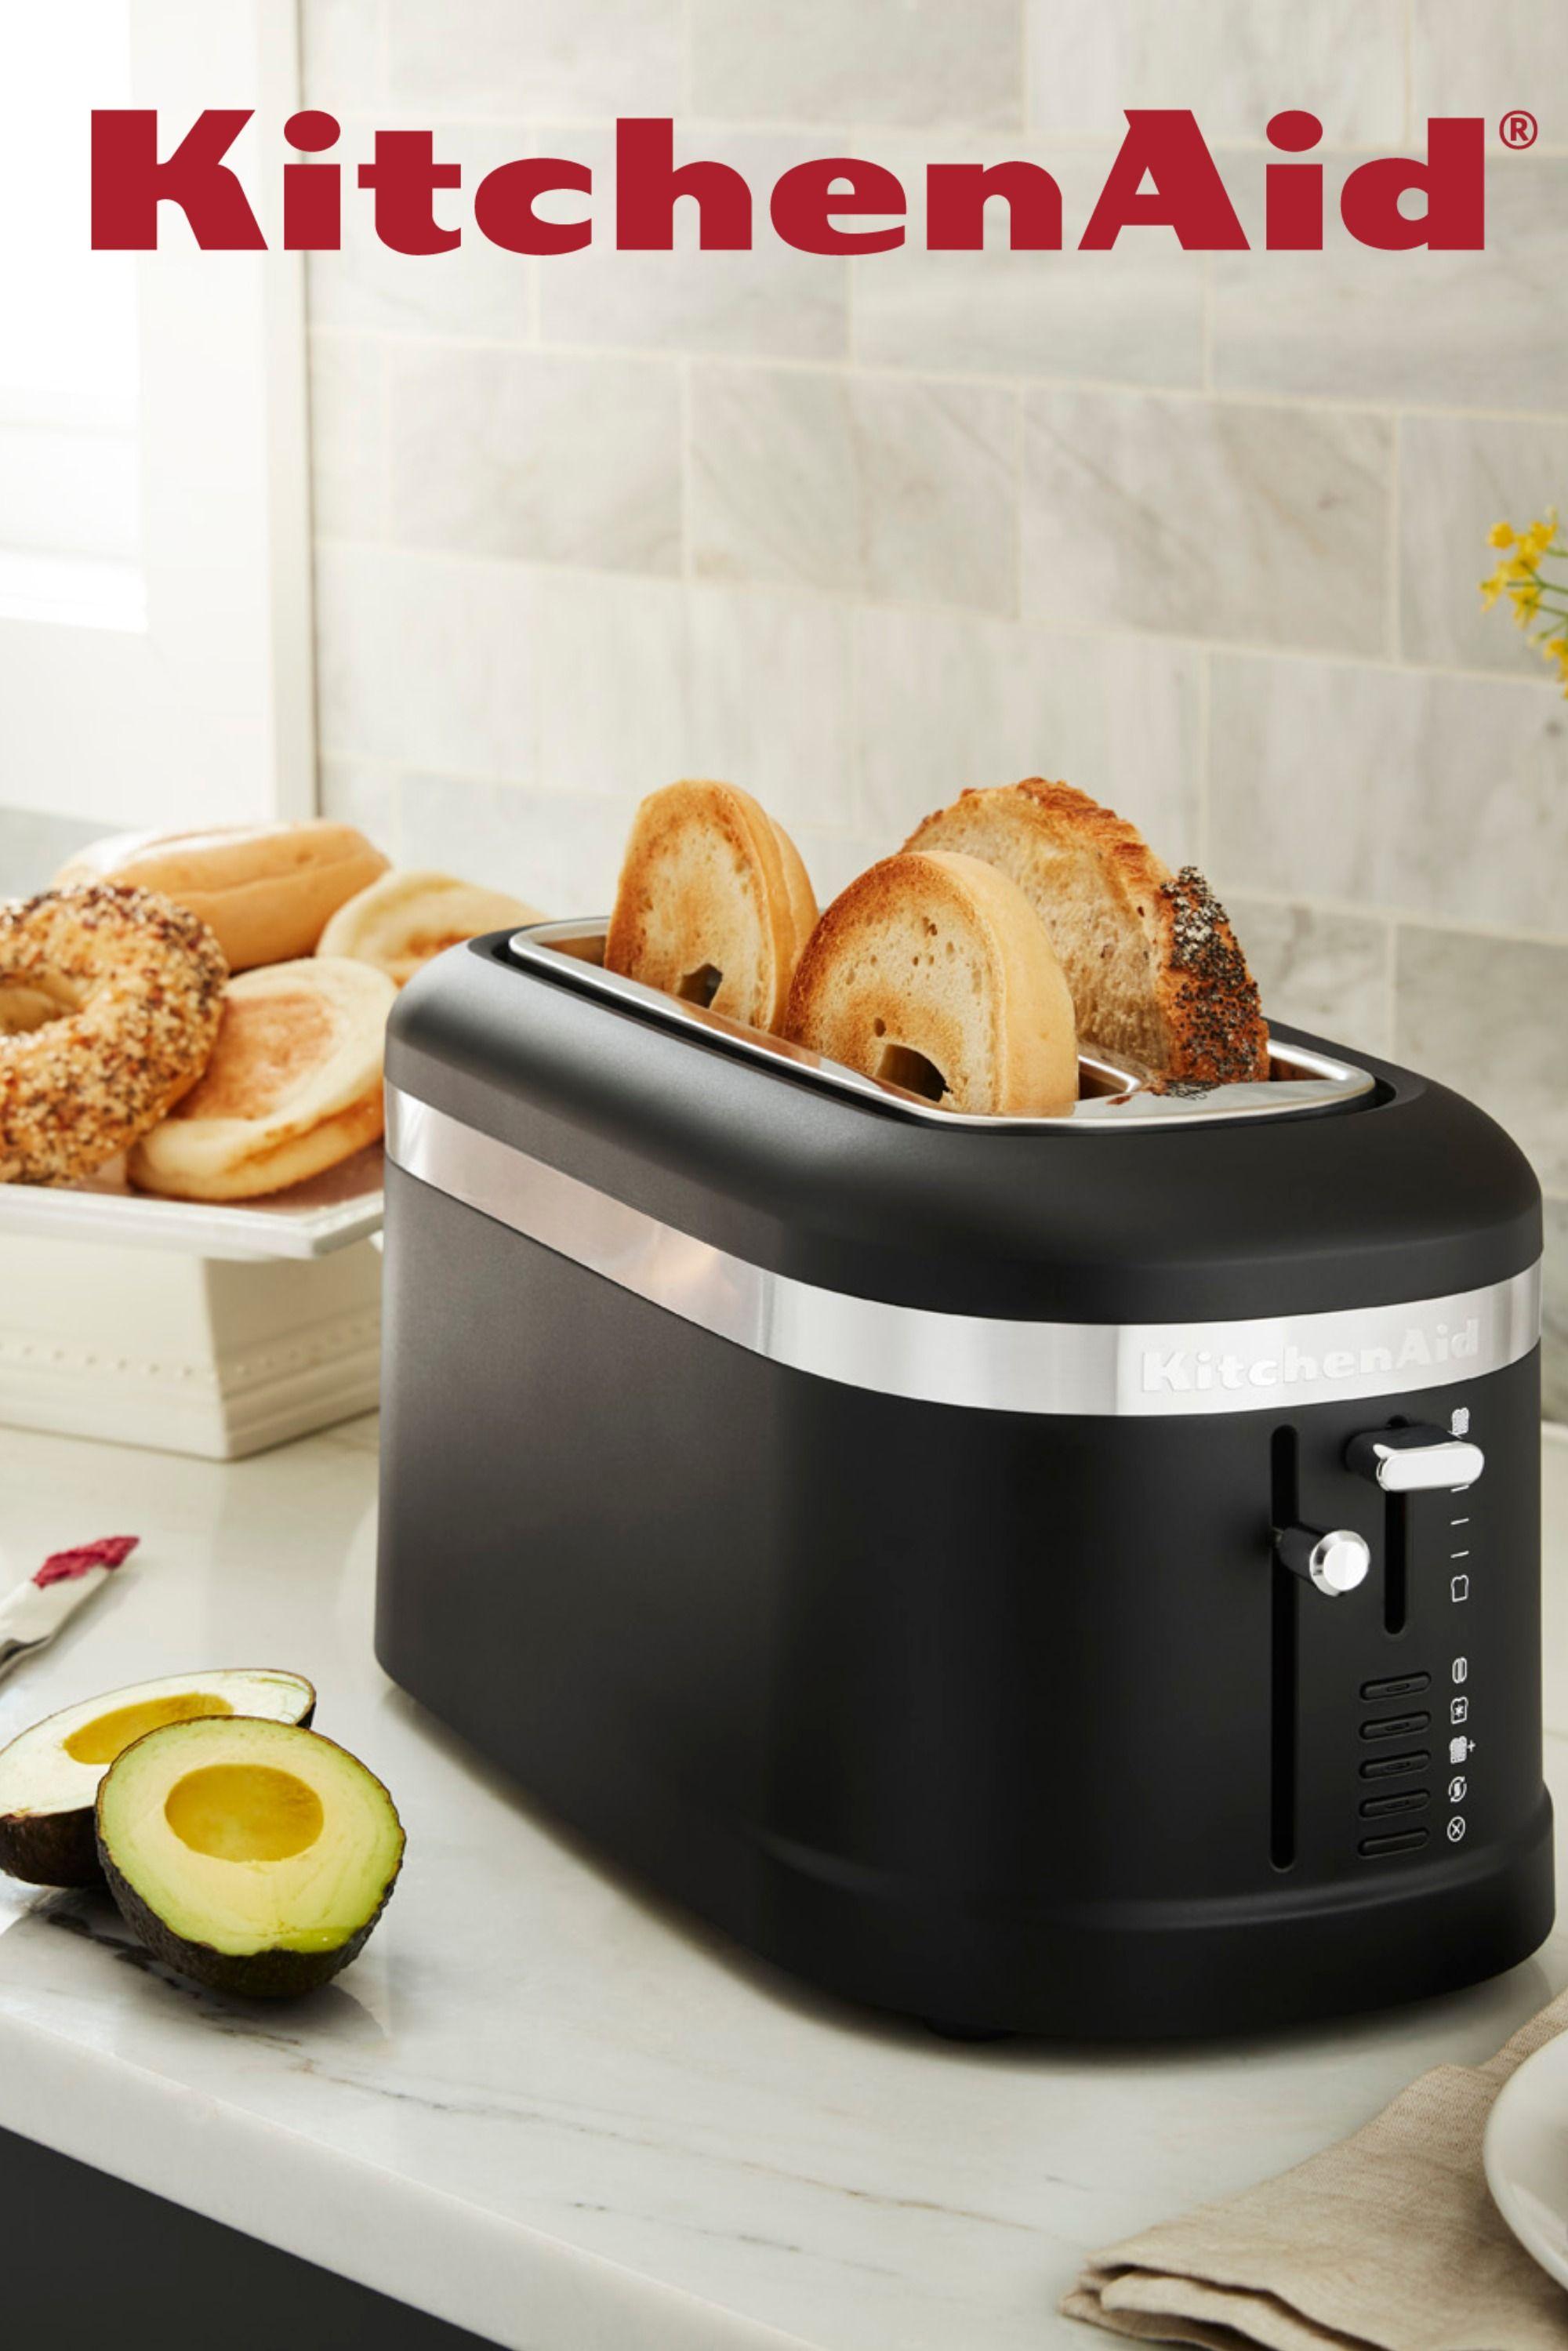 images?q=tbn:ANd9GcQh_l3eQ5xwiPy07kGEXjmjgmBKBRB7H2mRxCGhv1tFWg5c_mWT Kitchenaid Kmt4116cu 4 Slice Long Slot Toaster With High Lift Lever